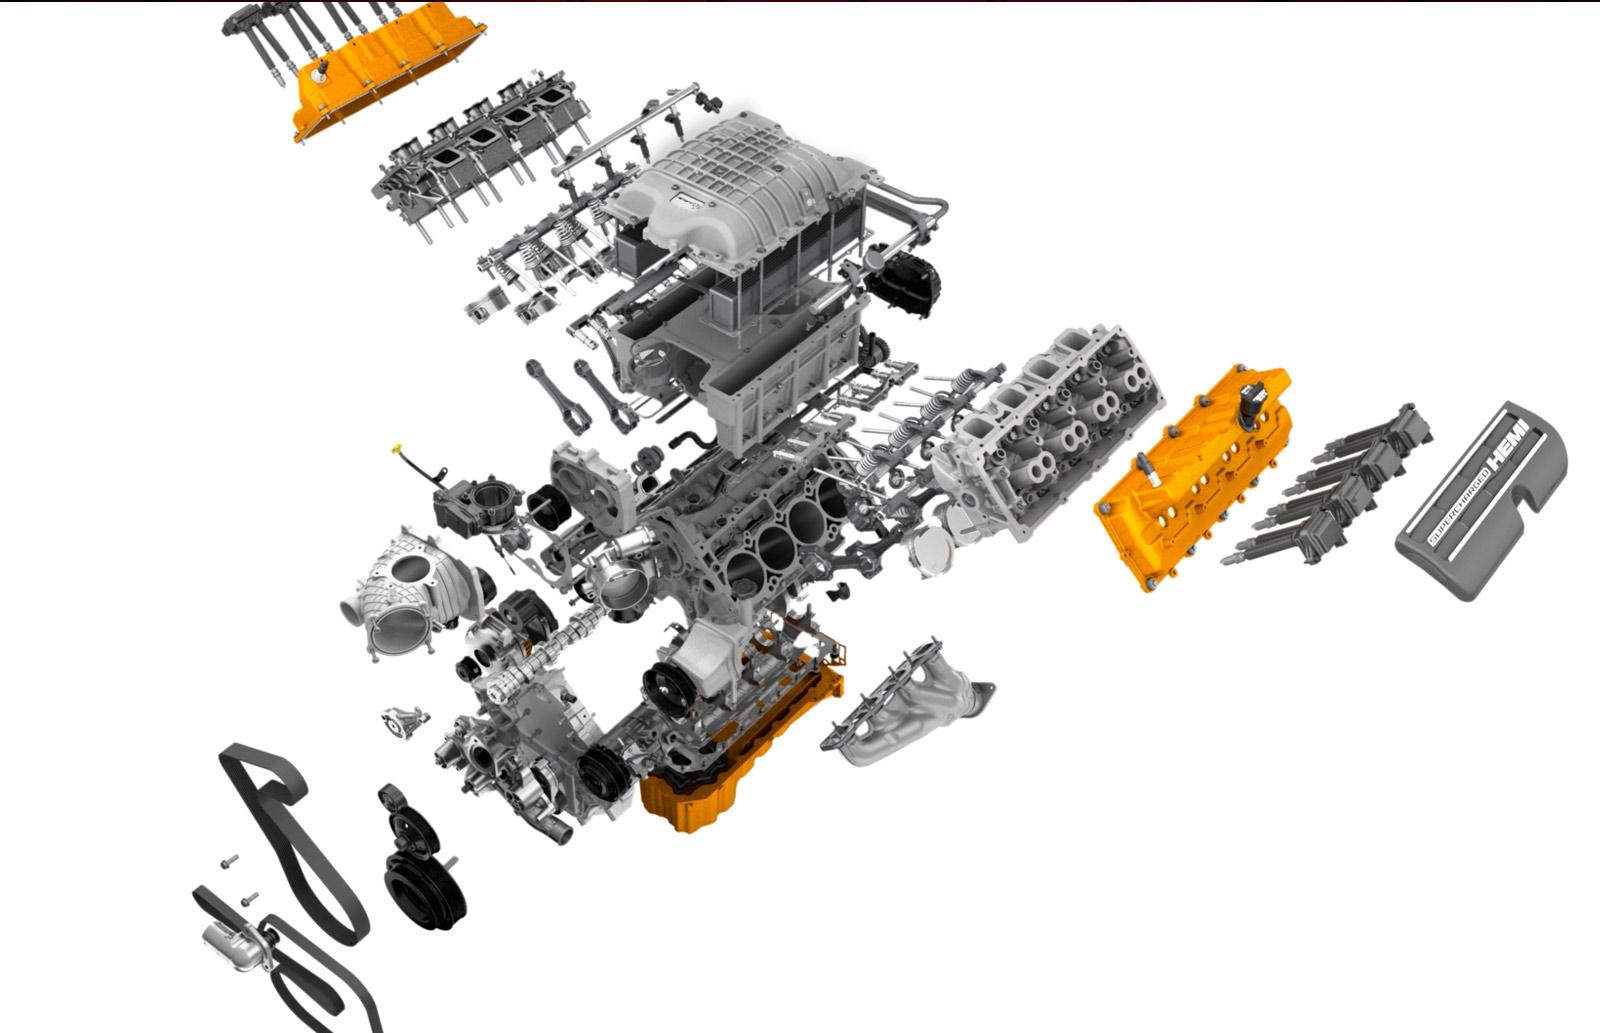 Srt Hellcat V8 6 2l Hemi Supercharged